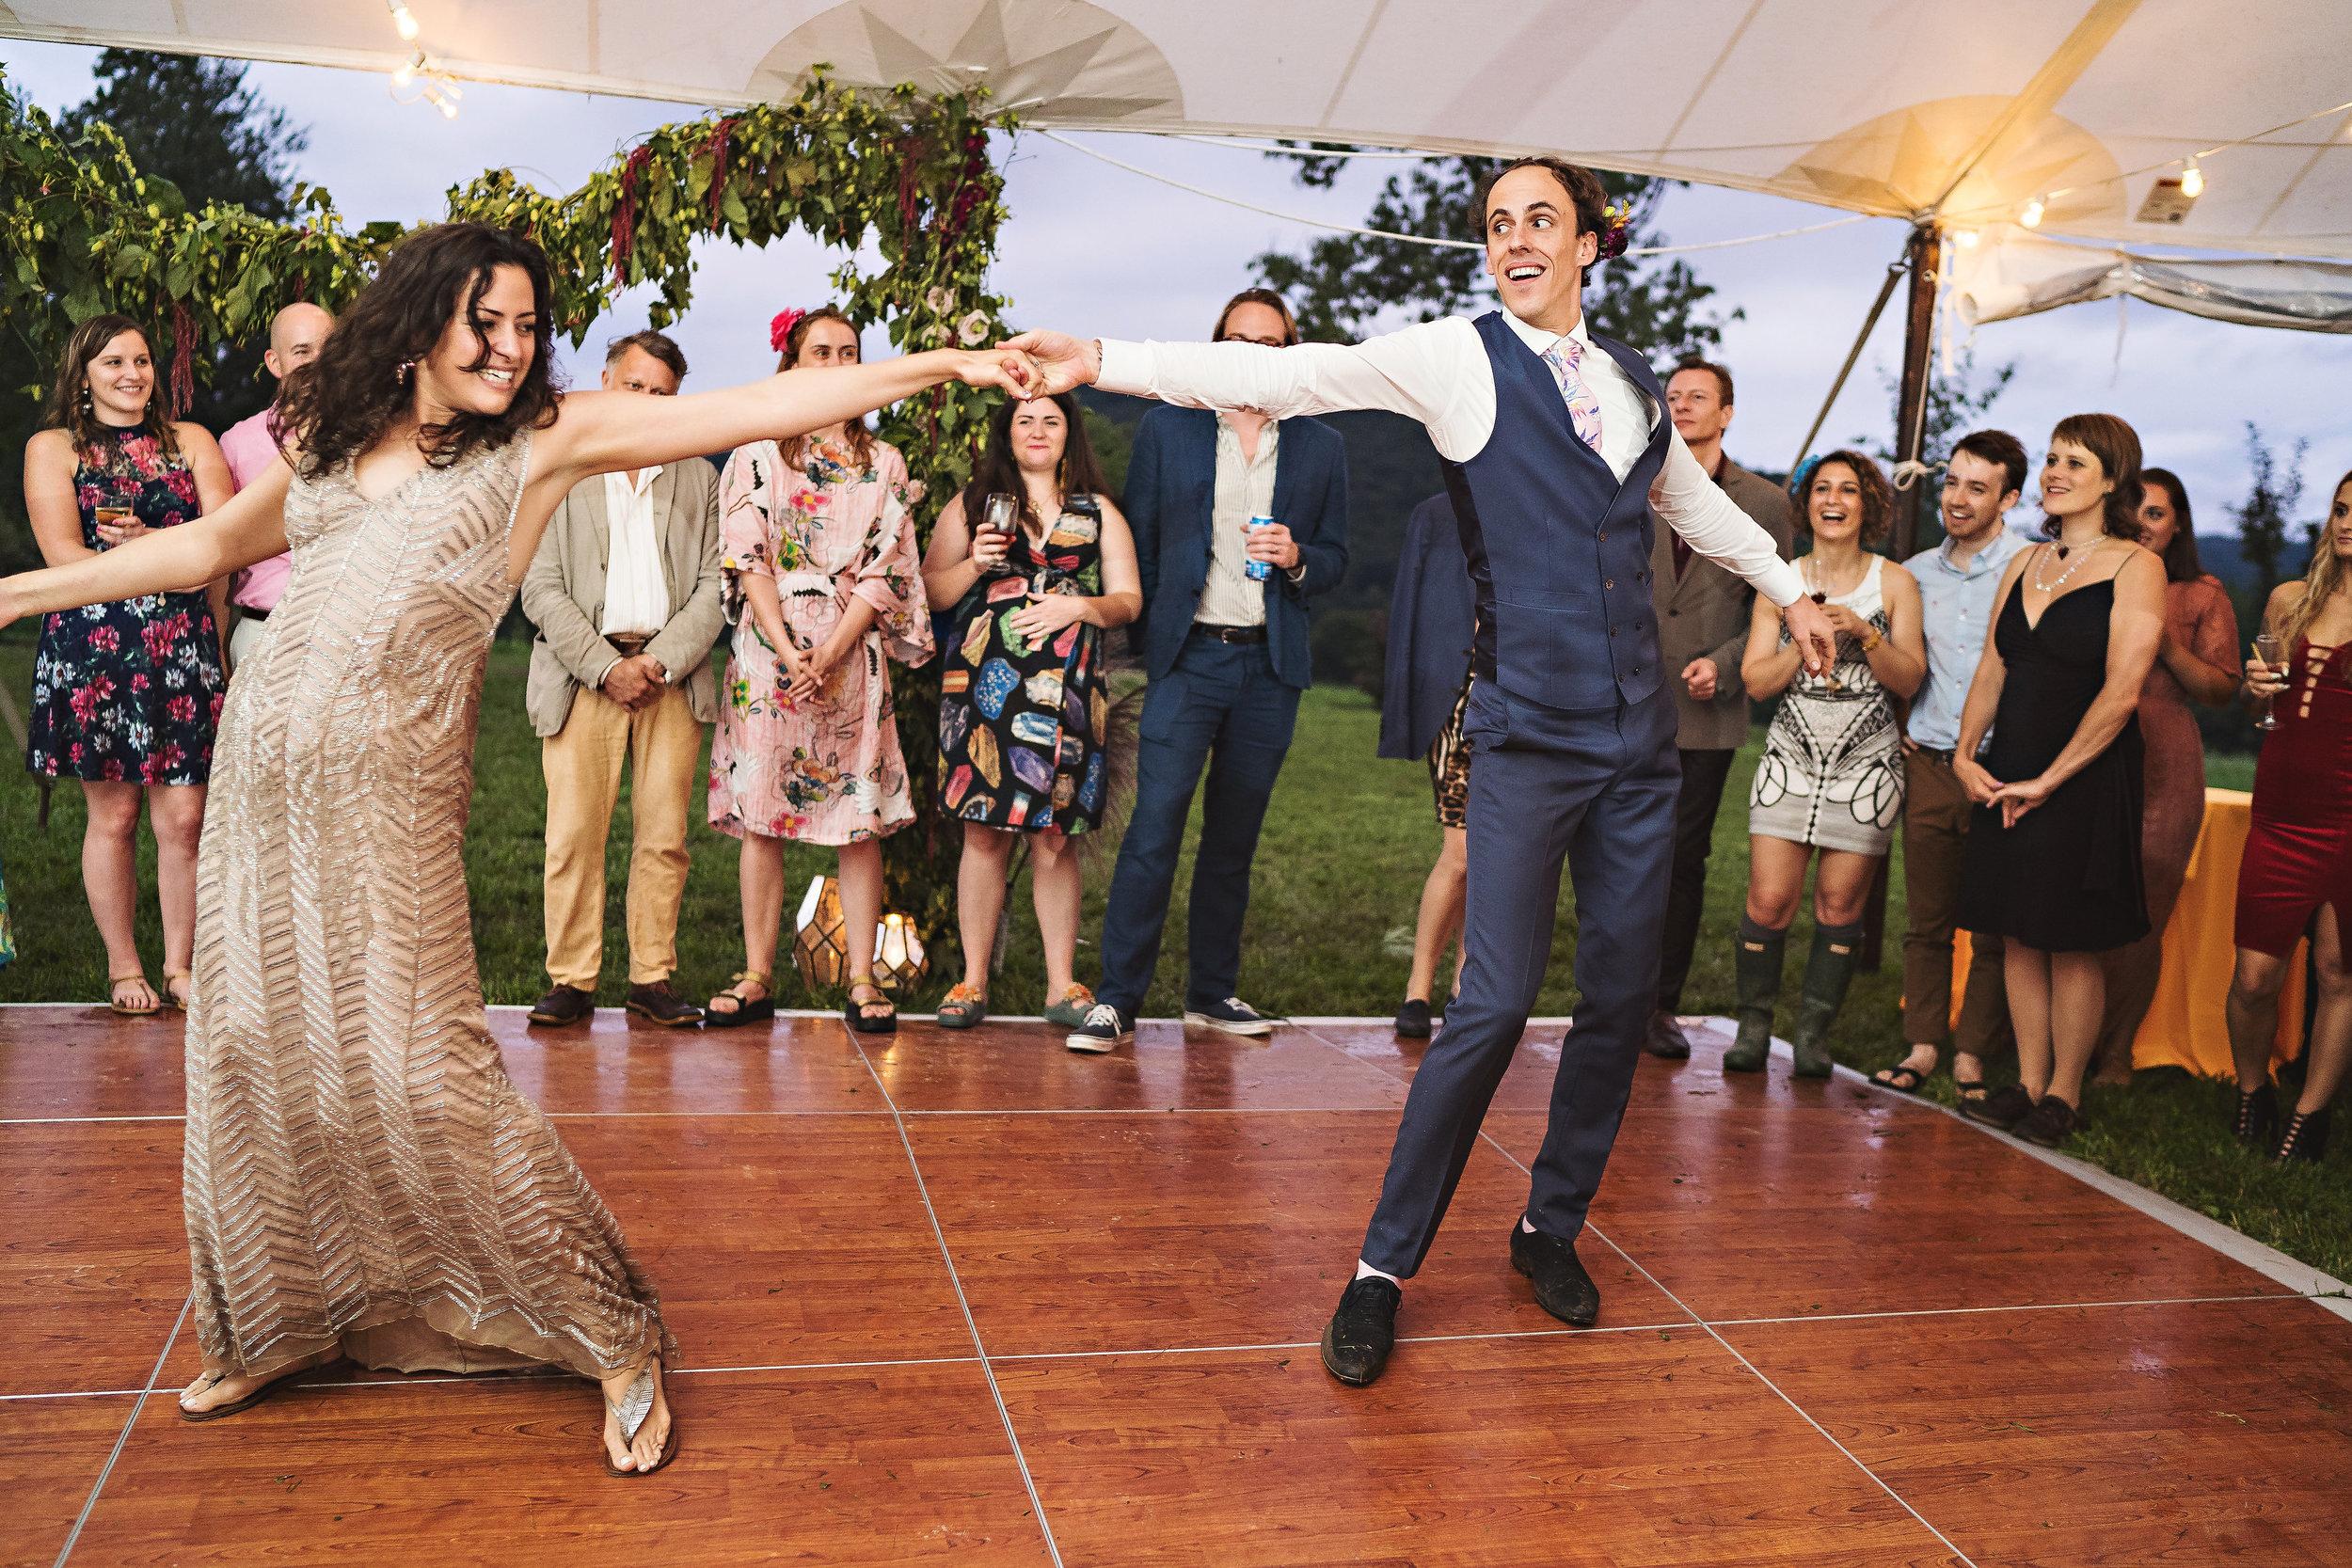 upstate-ny-wedding-jove-meyer-events-inbal-sivan-0105.jpg